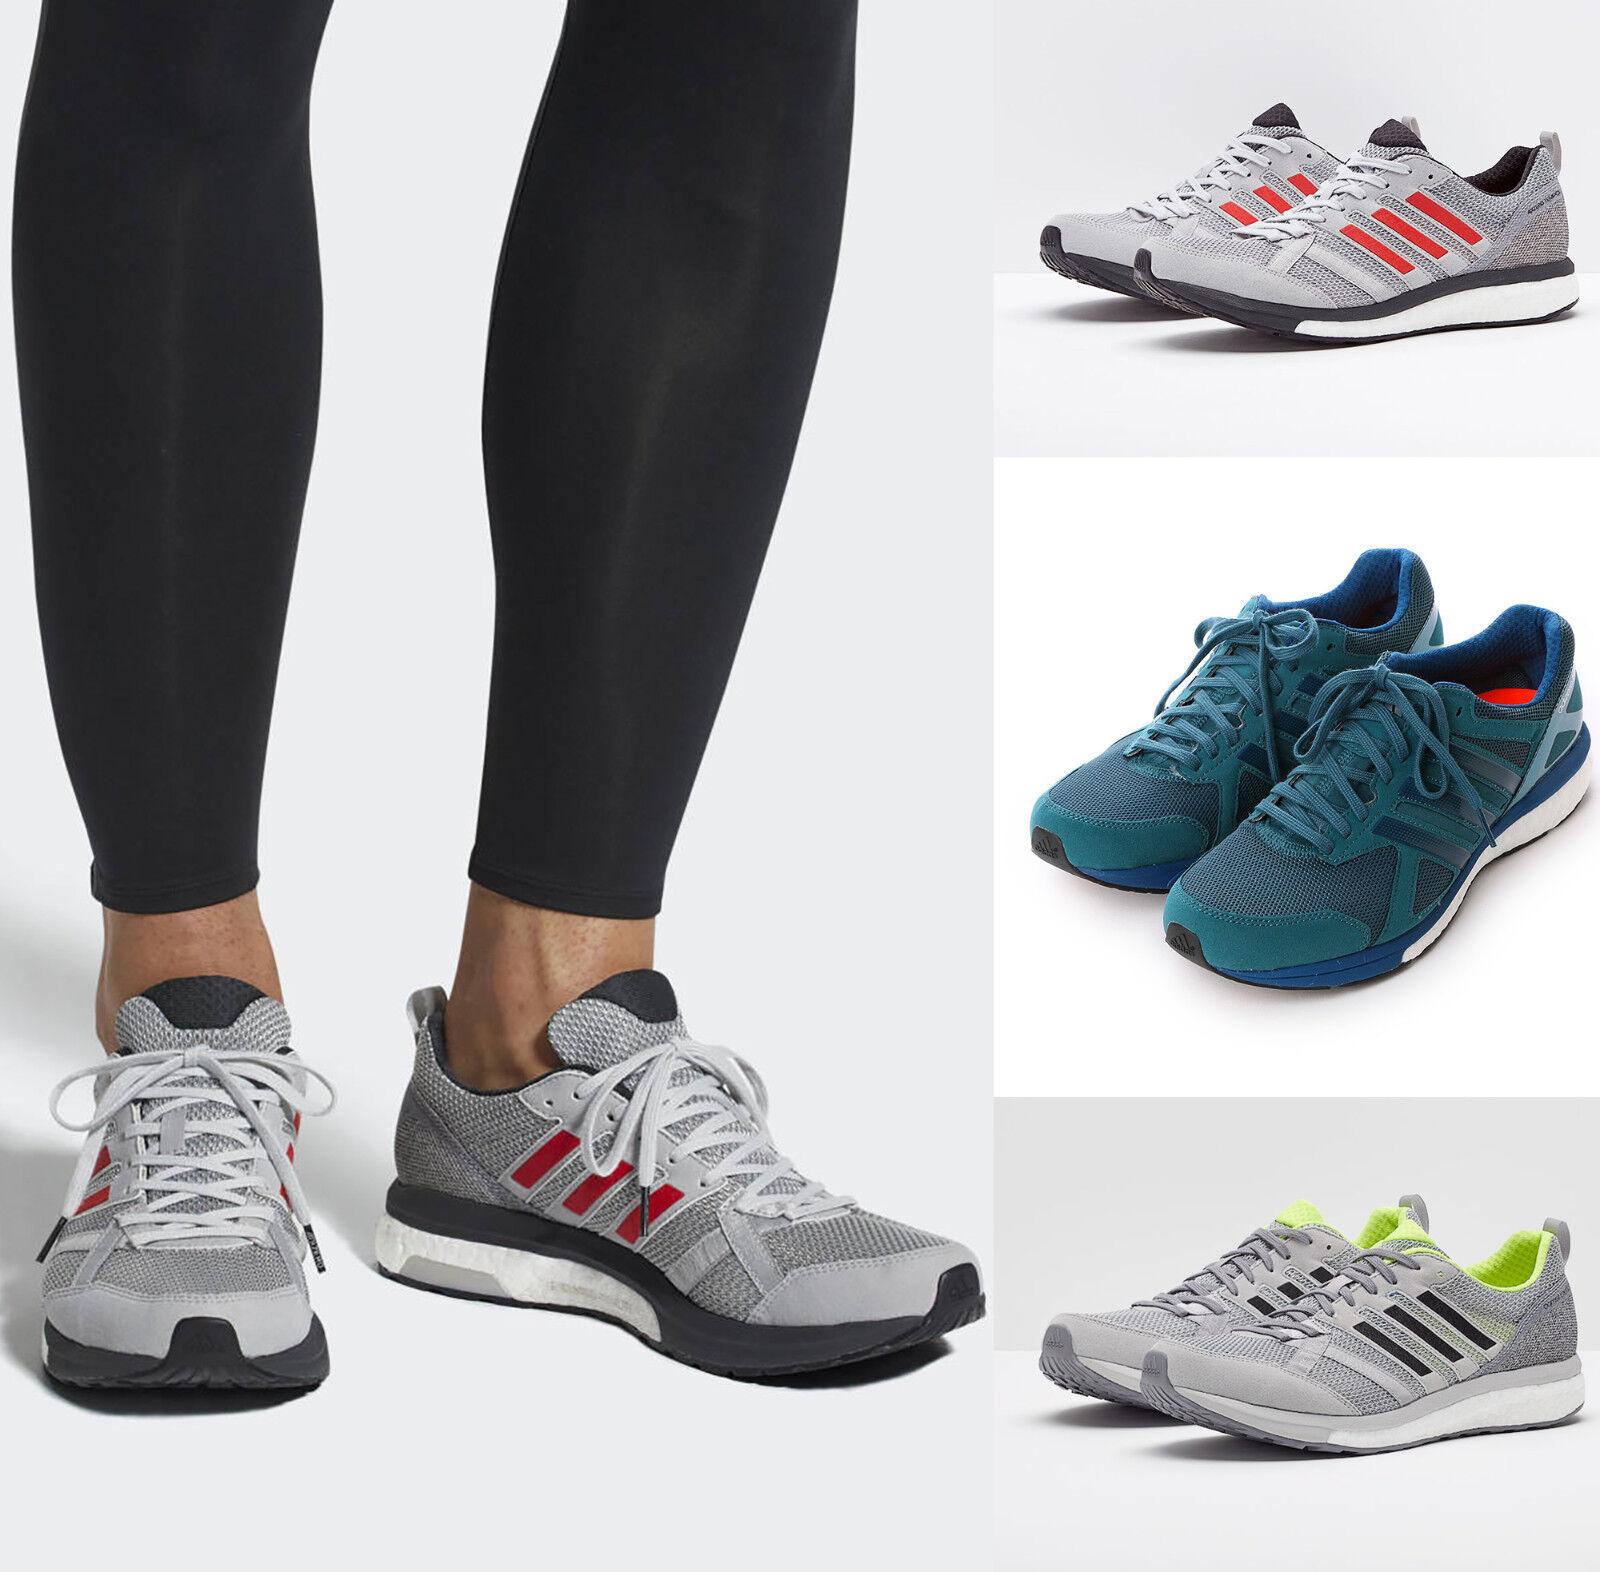 Mens ADIDAS ADIZERO TEMPO 9 M Running shoes NEW